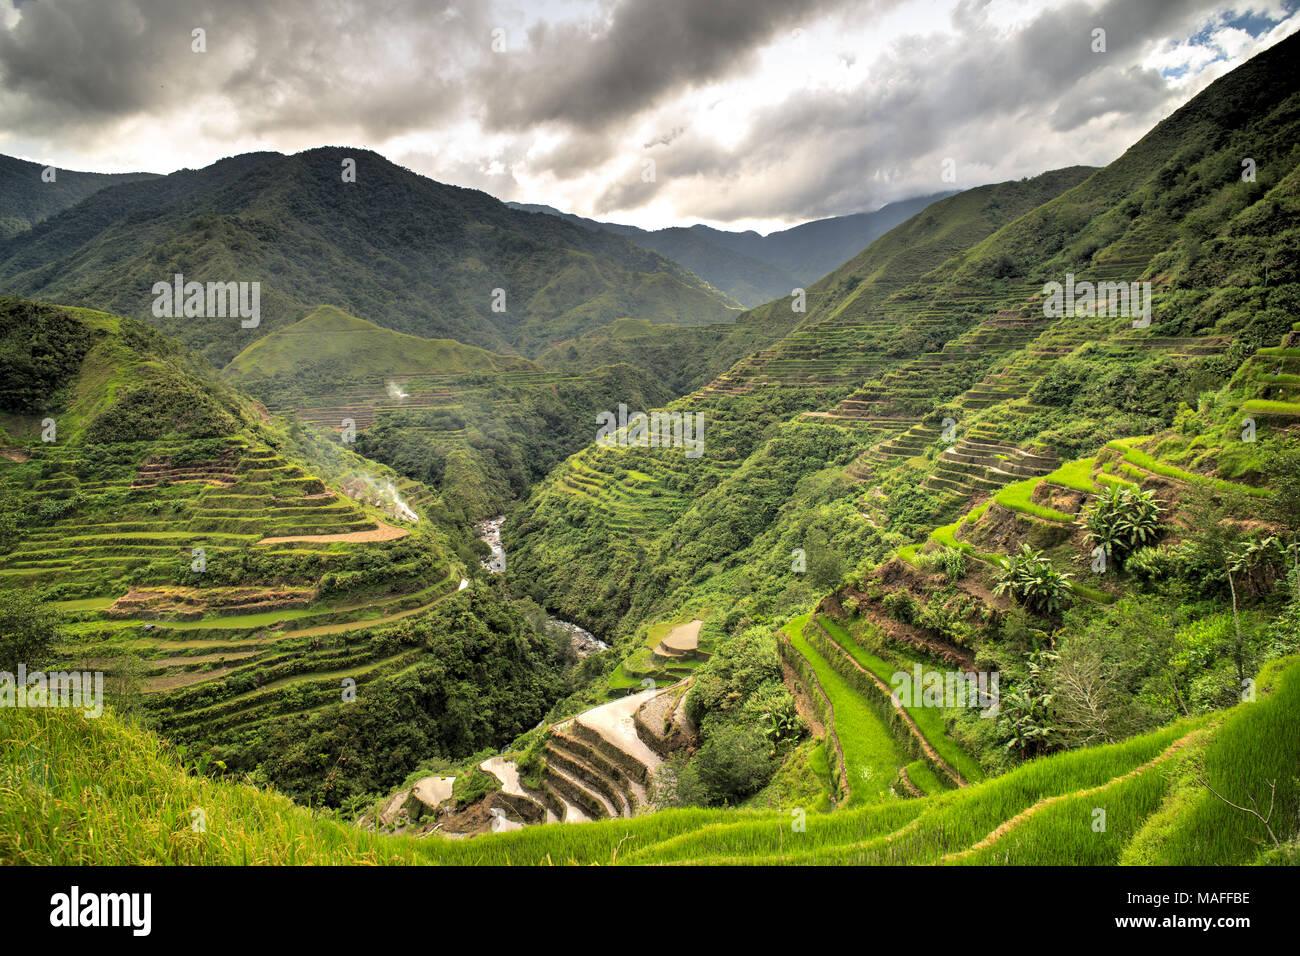 amazing rice terraces landscape - Stock Image